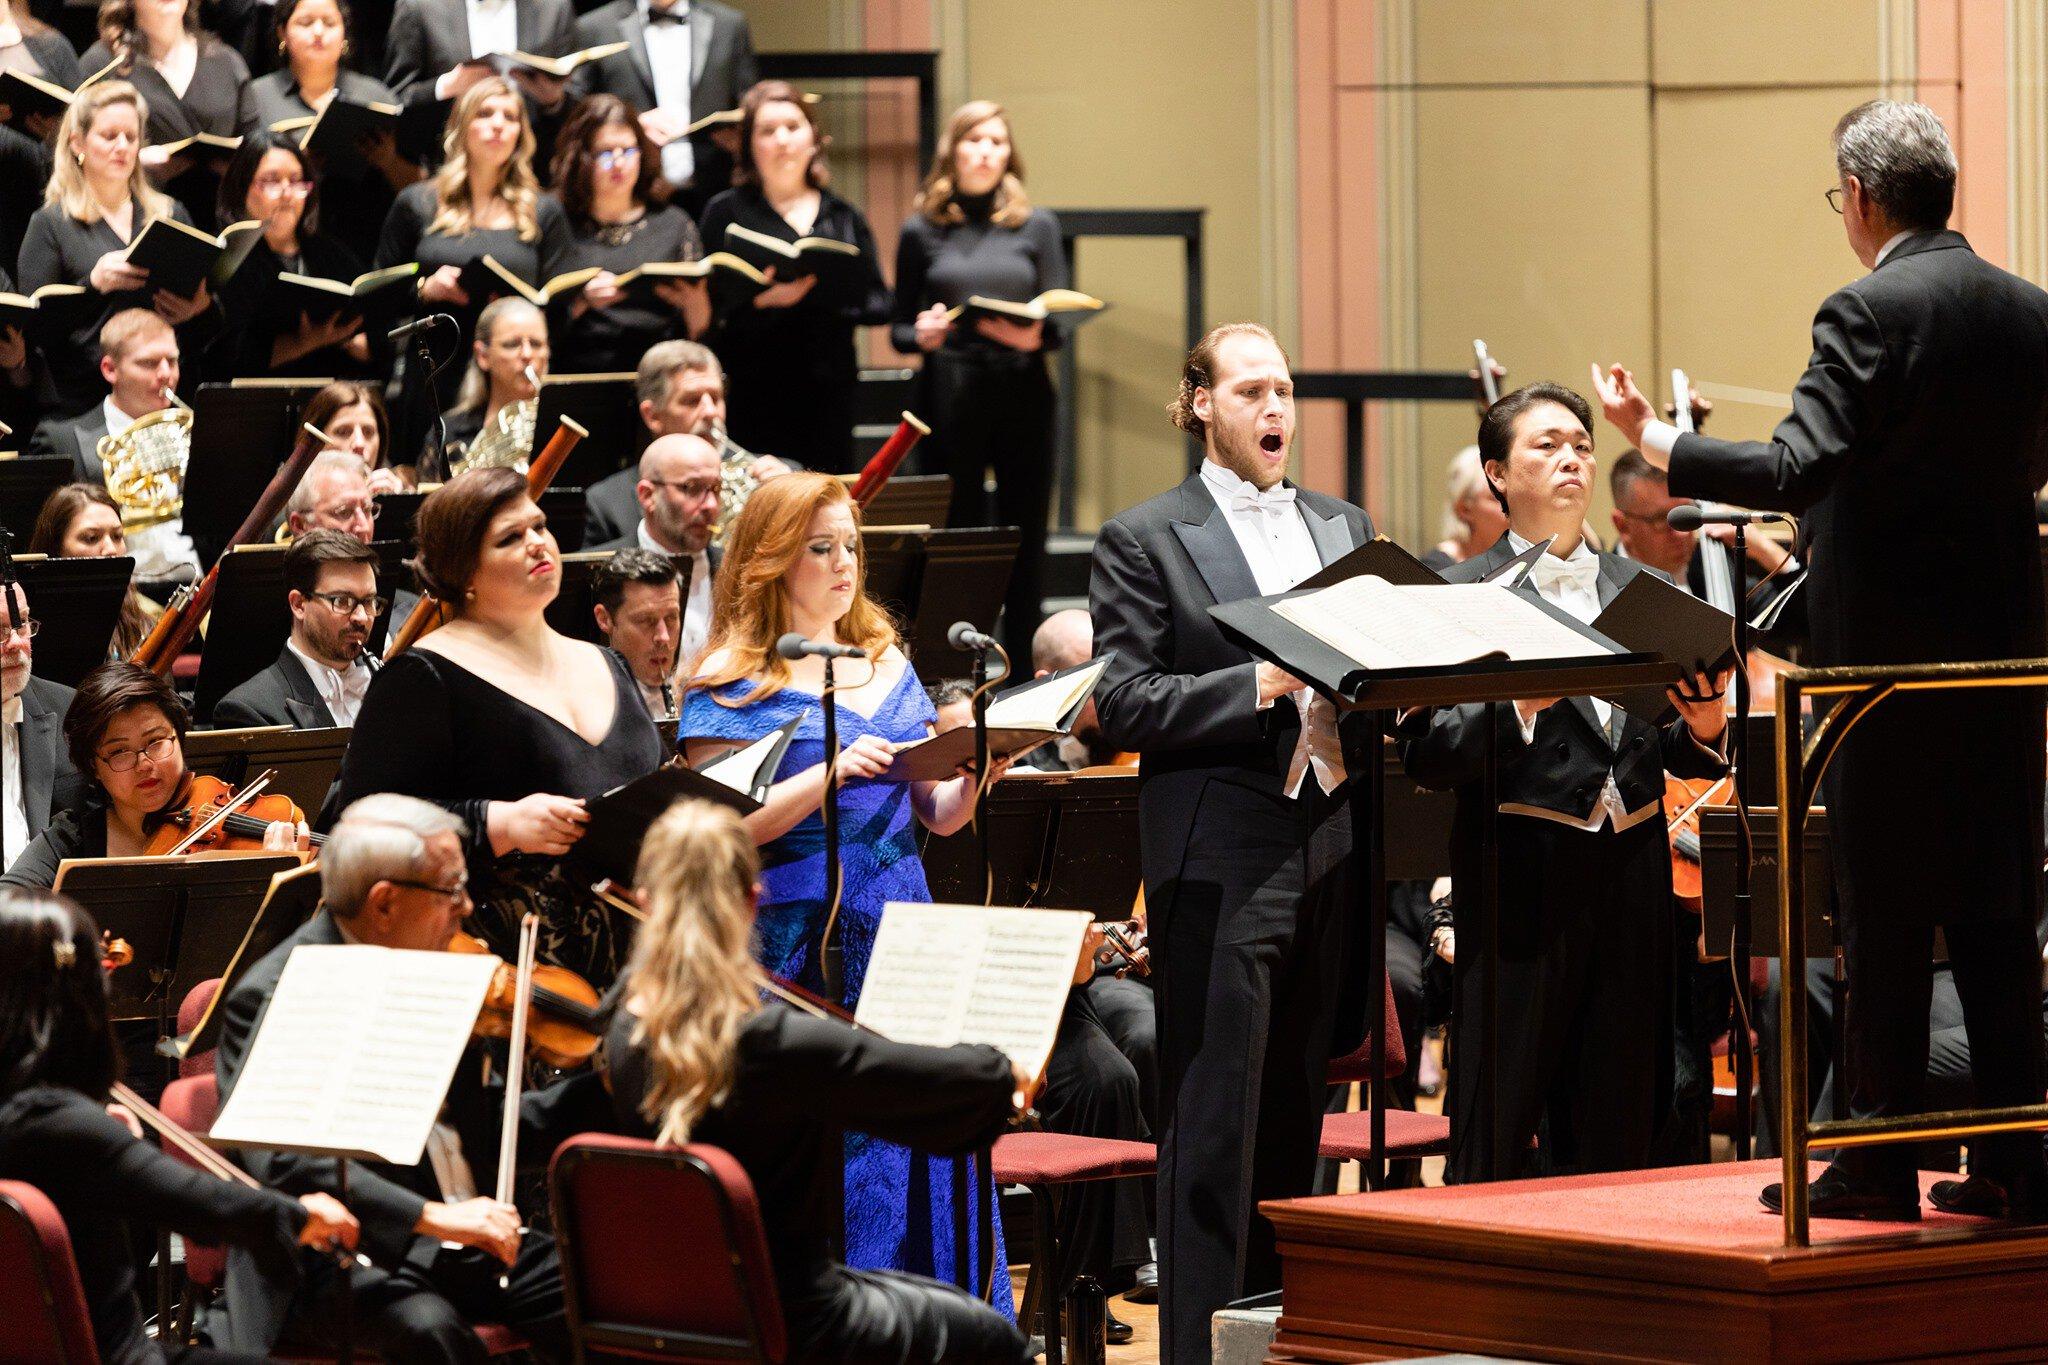 Opera Philadelphia's presentation of the Verdi Requiem